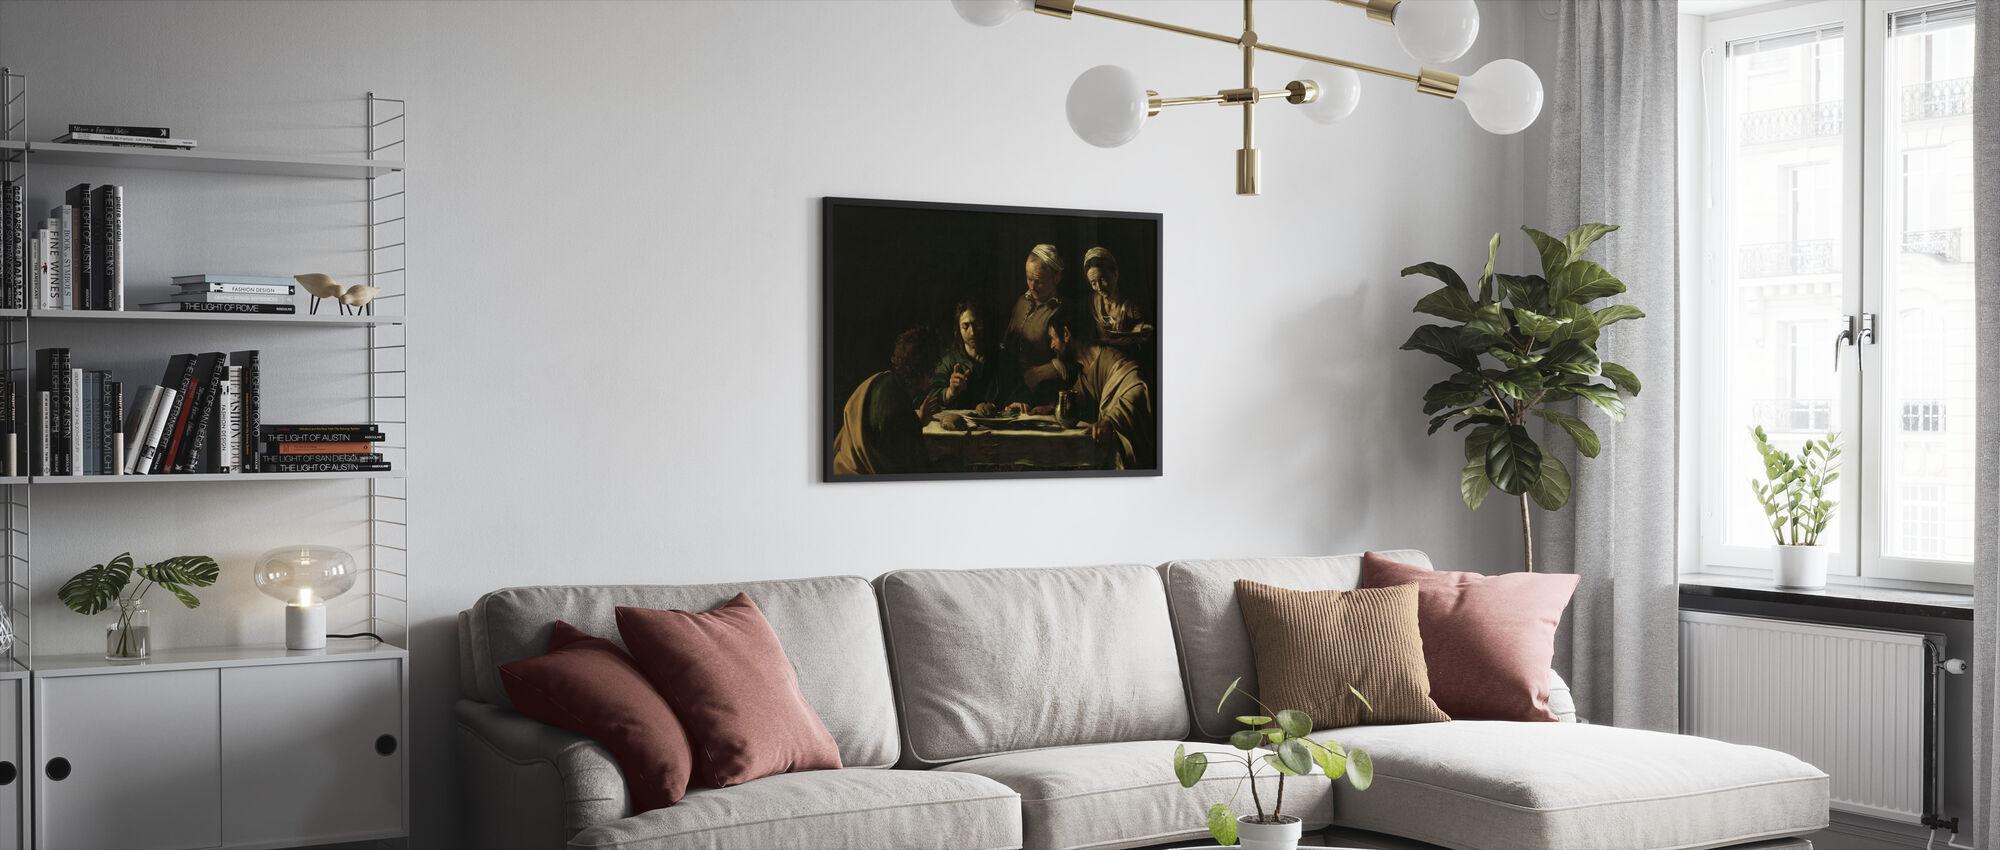 Supper at Emmaus - Michelangelo Caravaggio - Framed print - Living Room